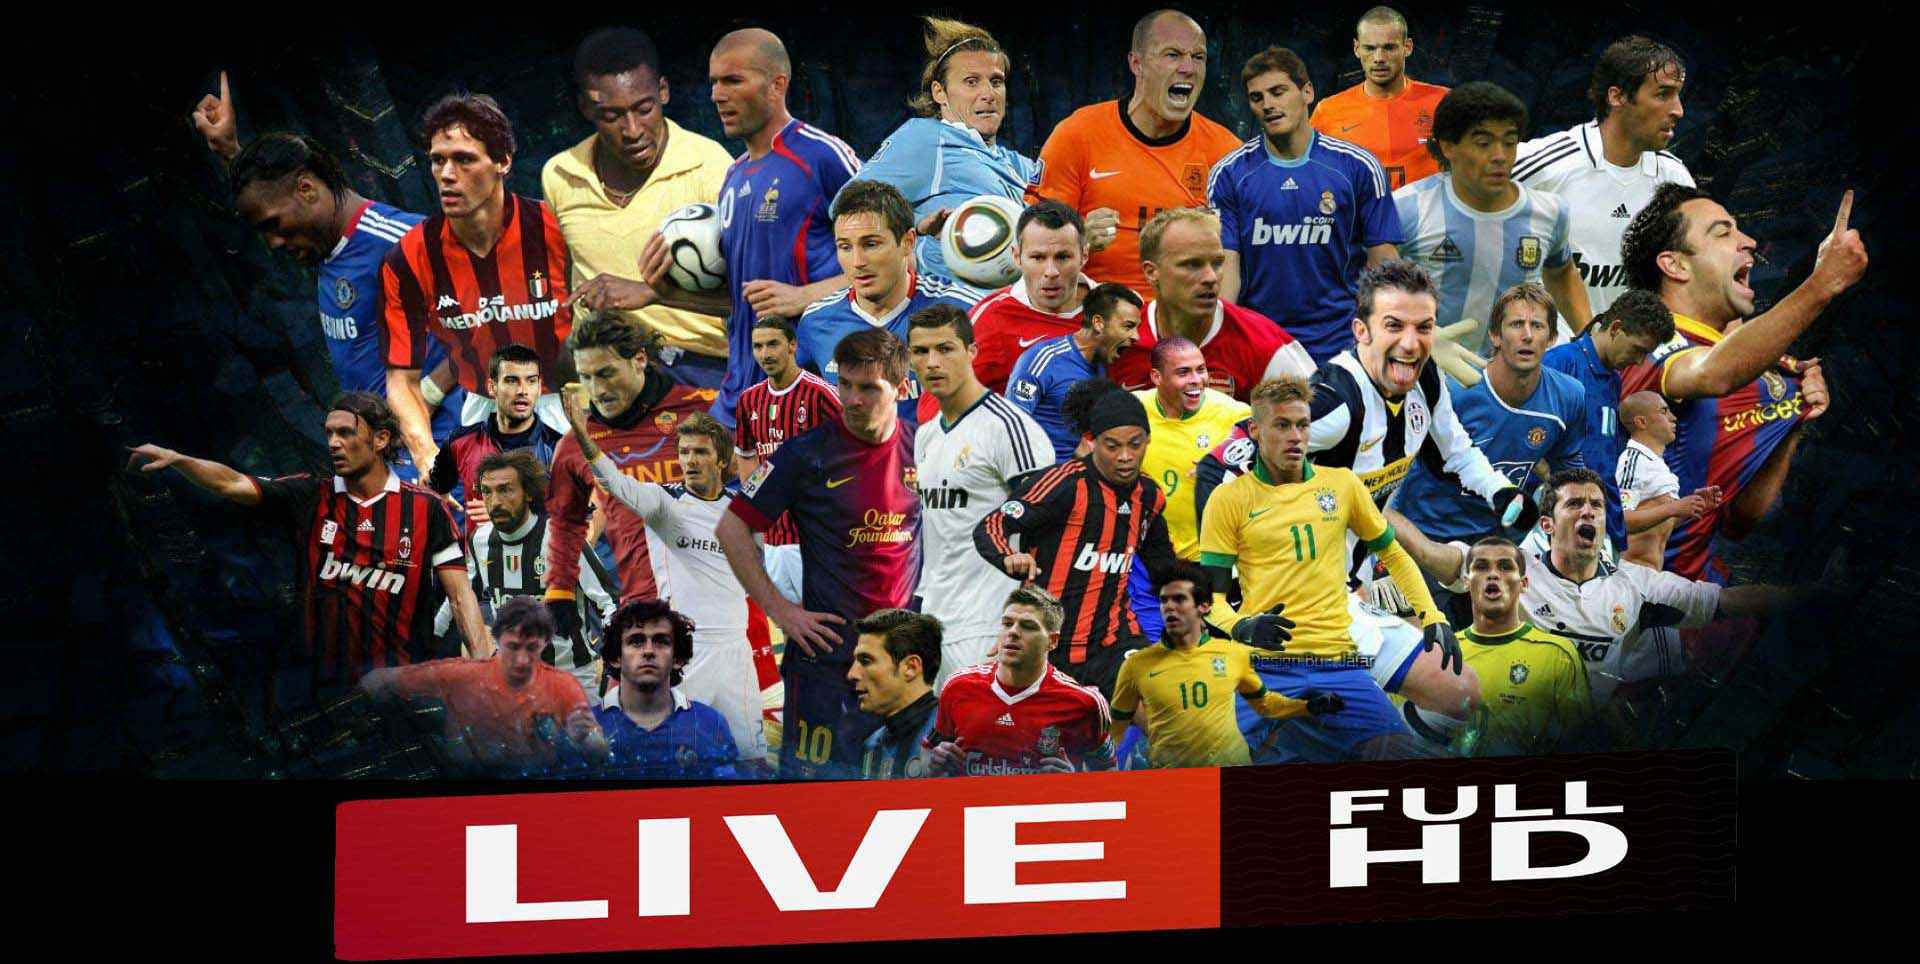 watch-napoli-vs-real-madrid-uefa-live